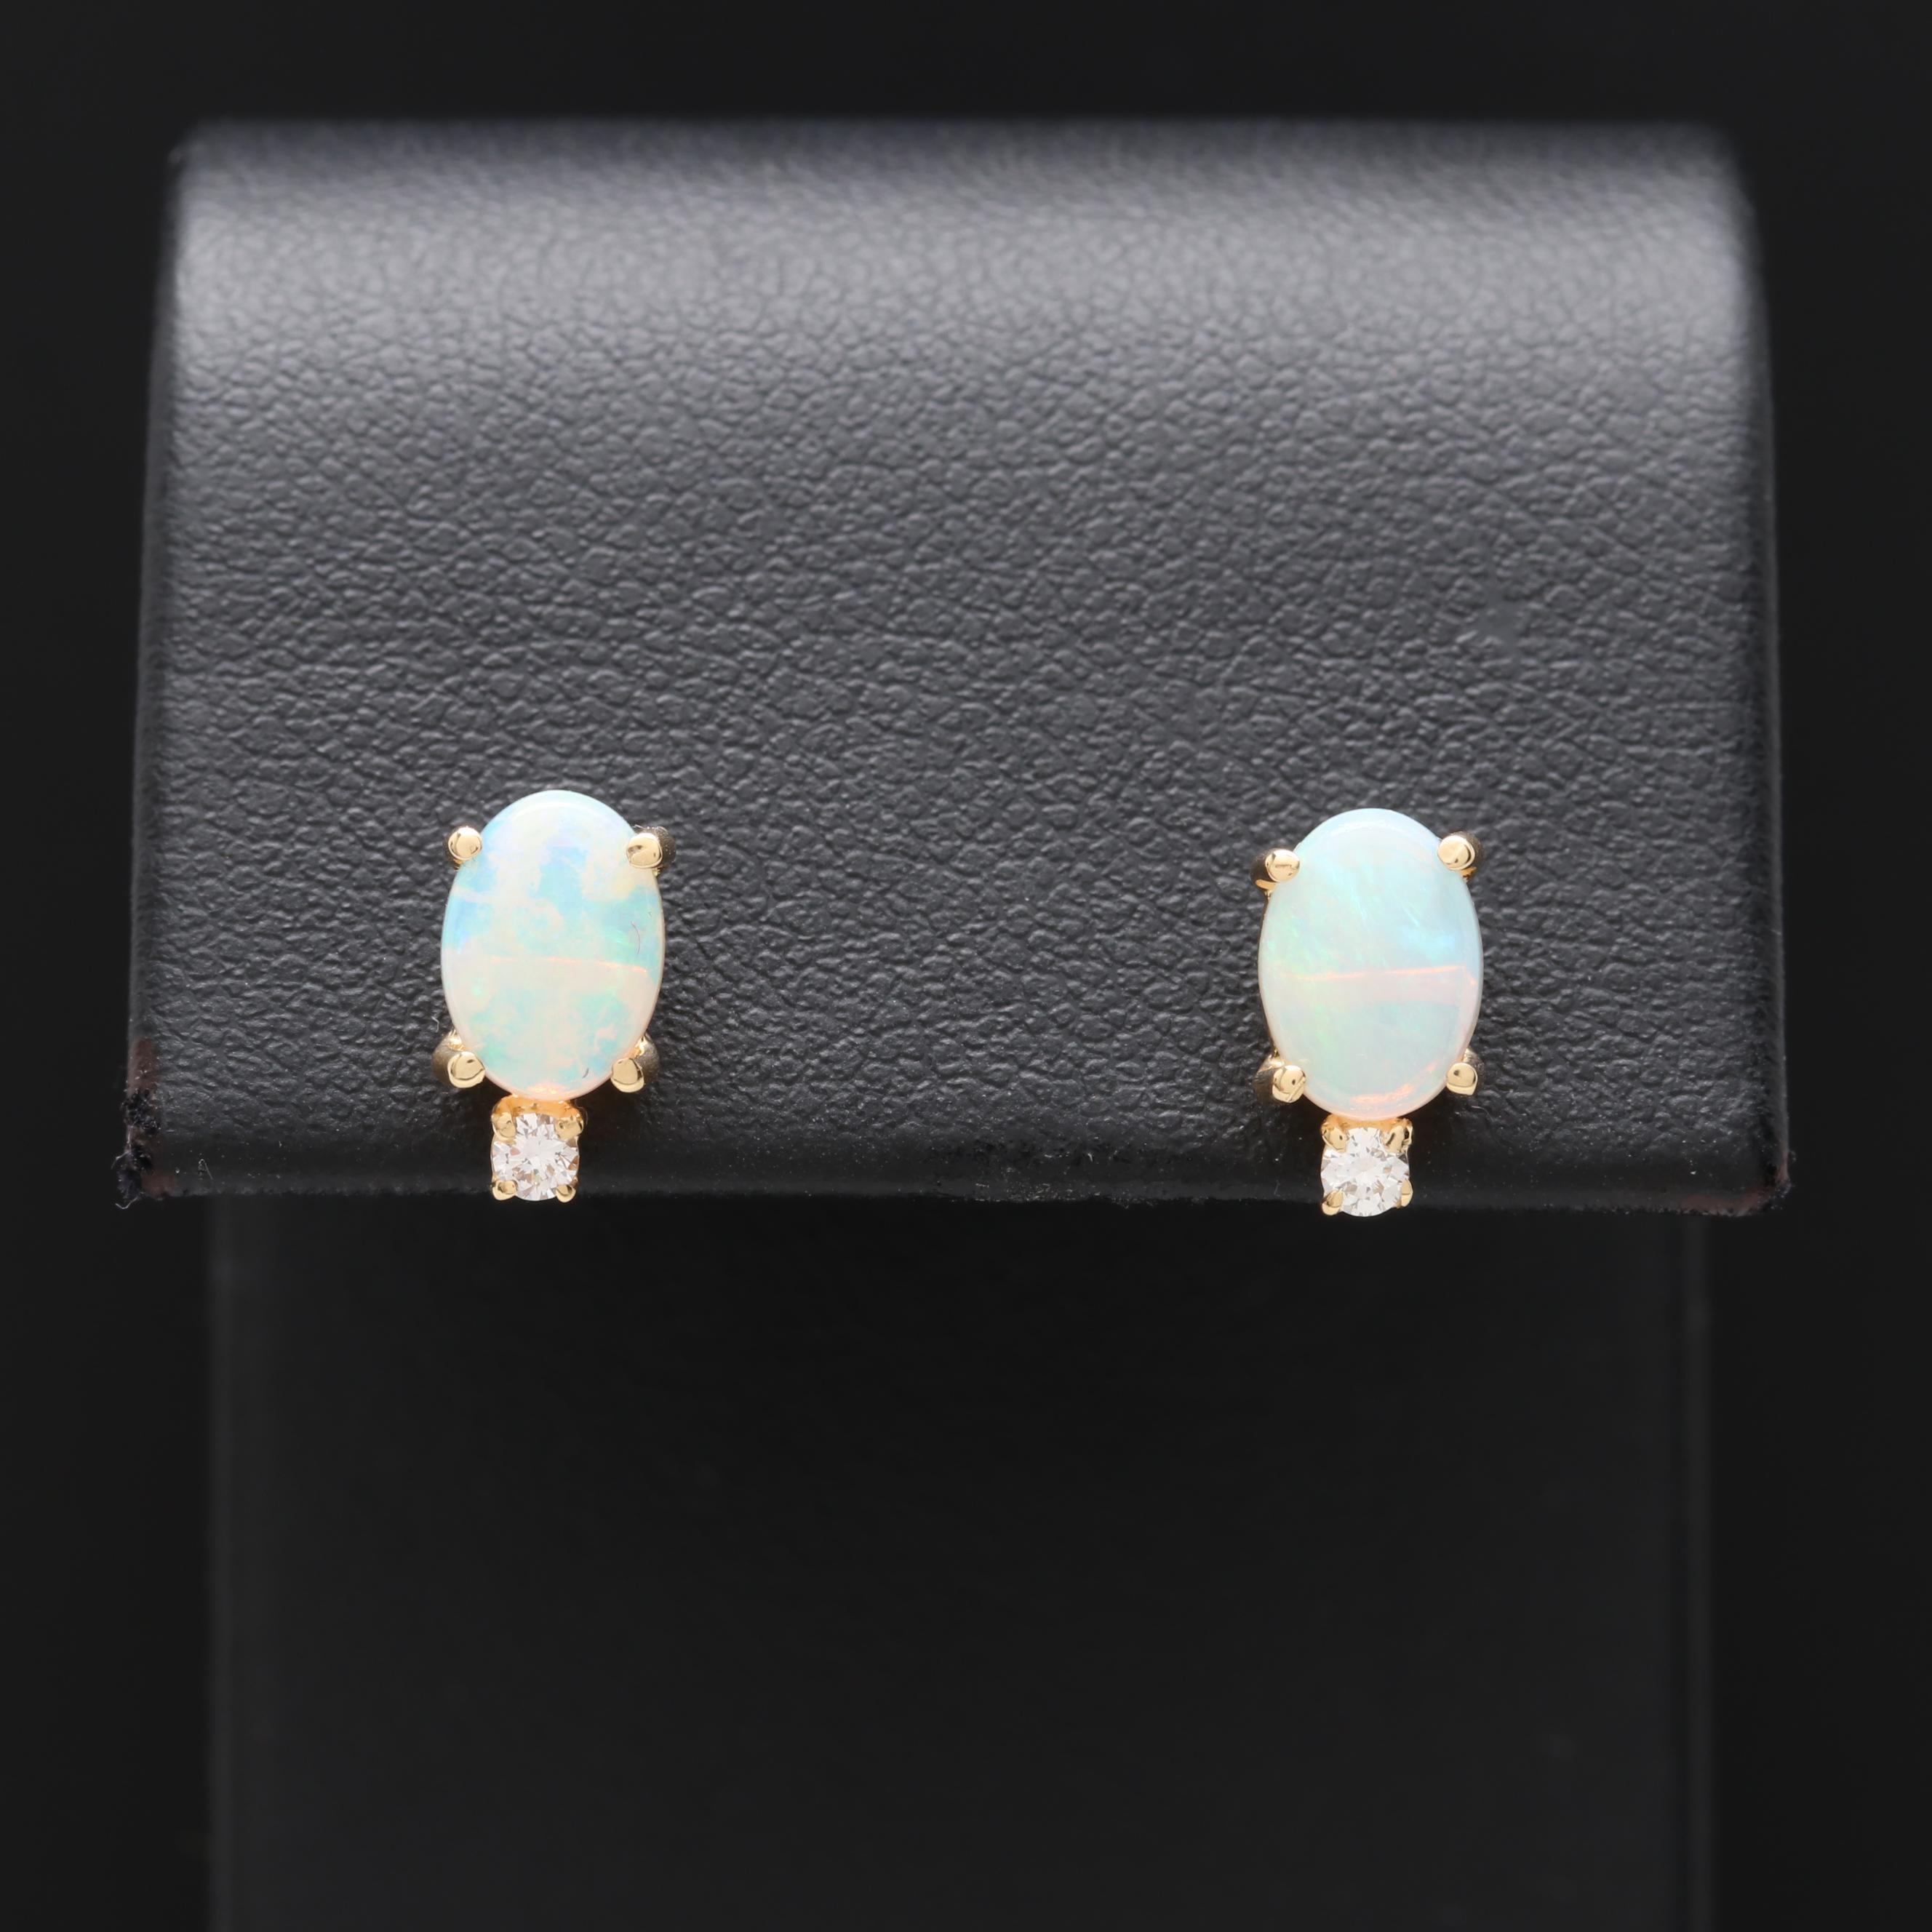 18K Yellow Gold Opal and Diamond Stud Earrings